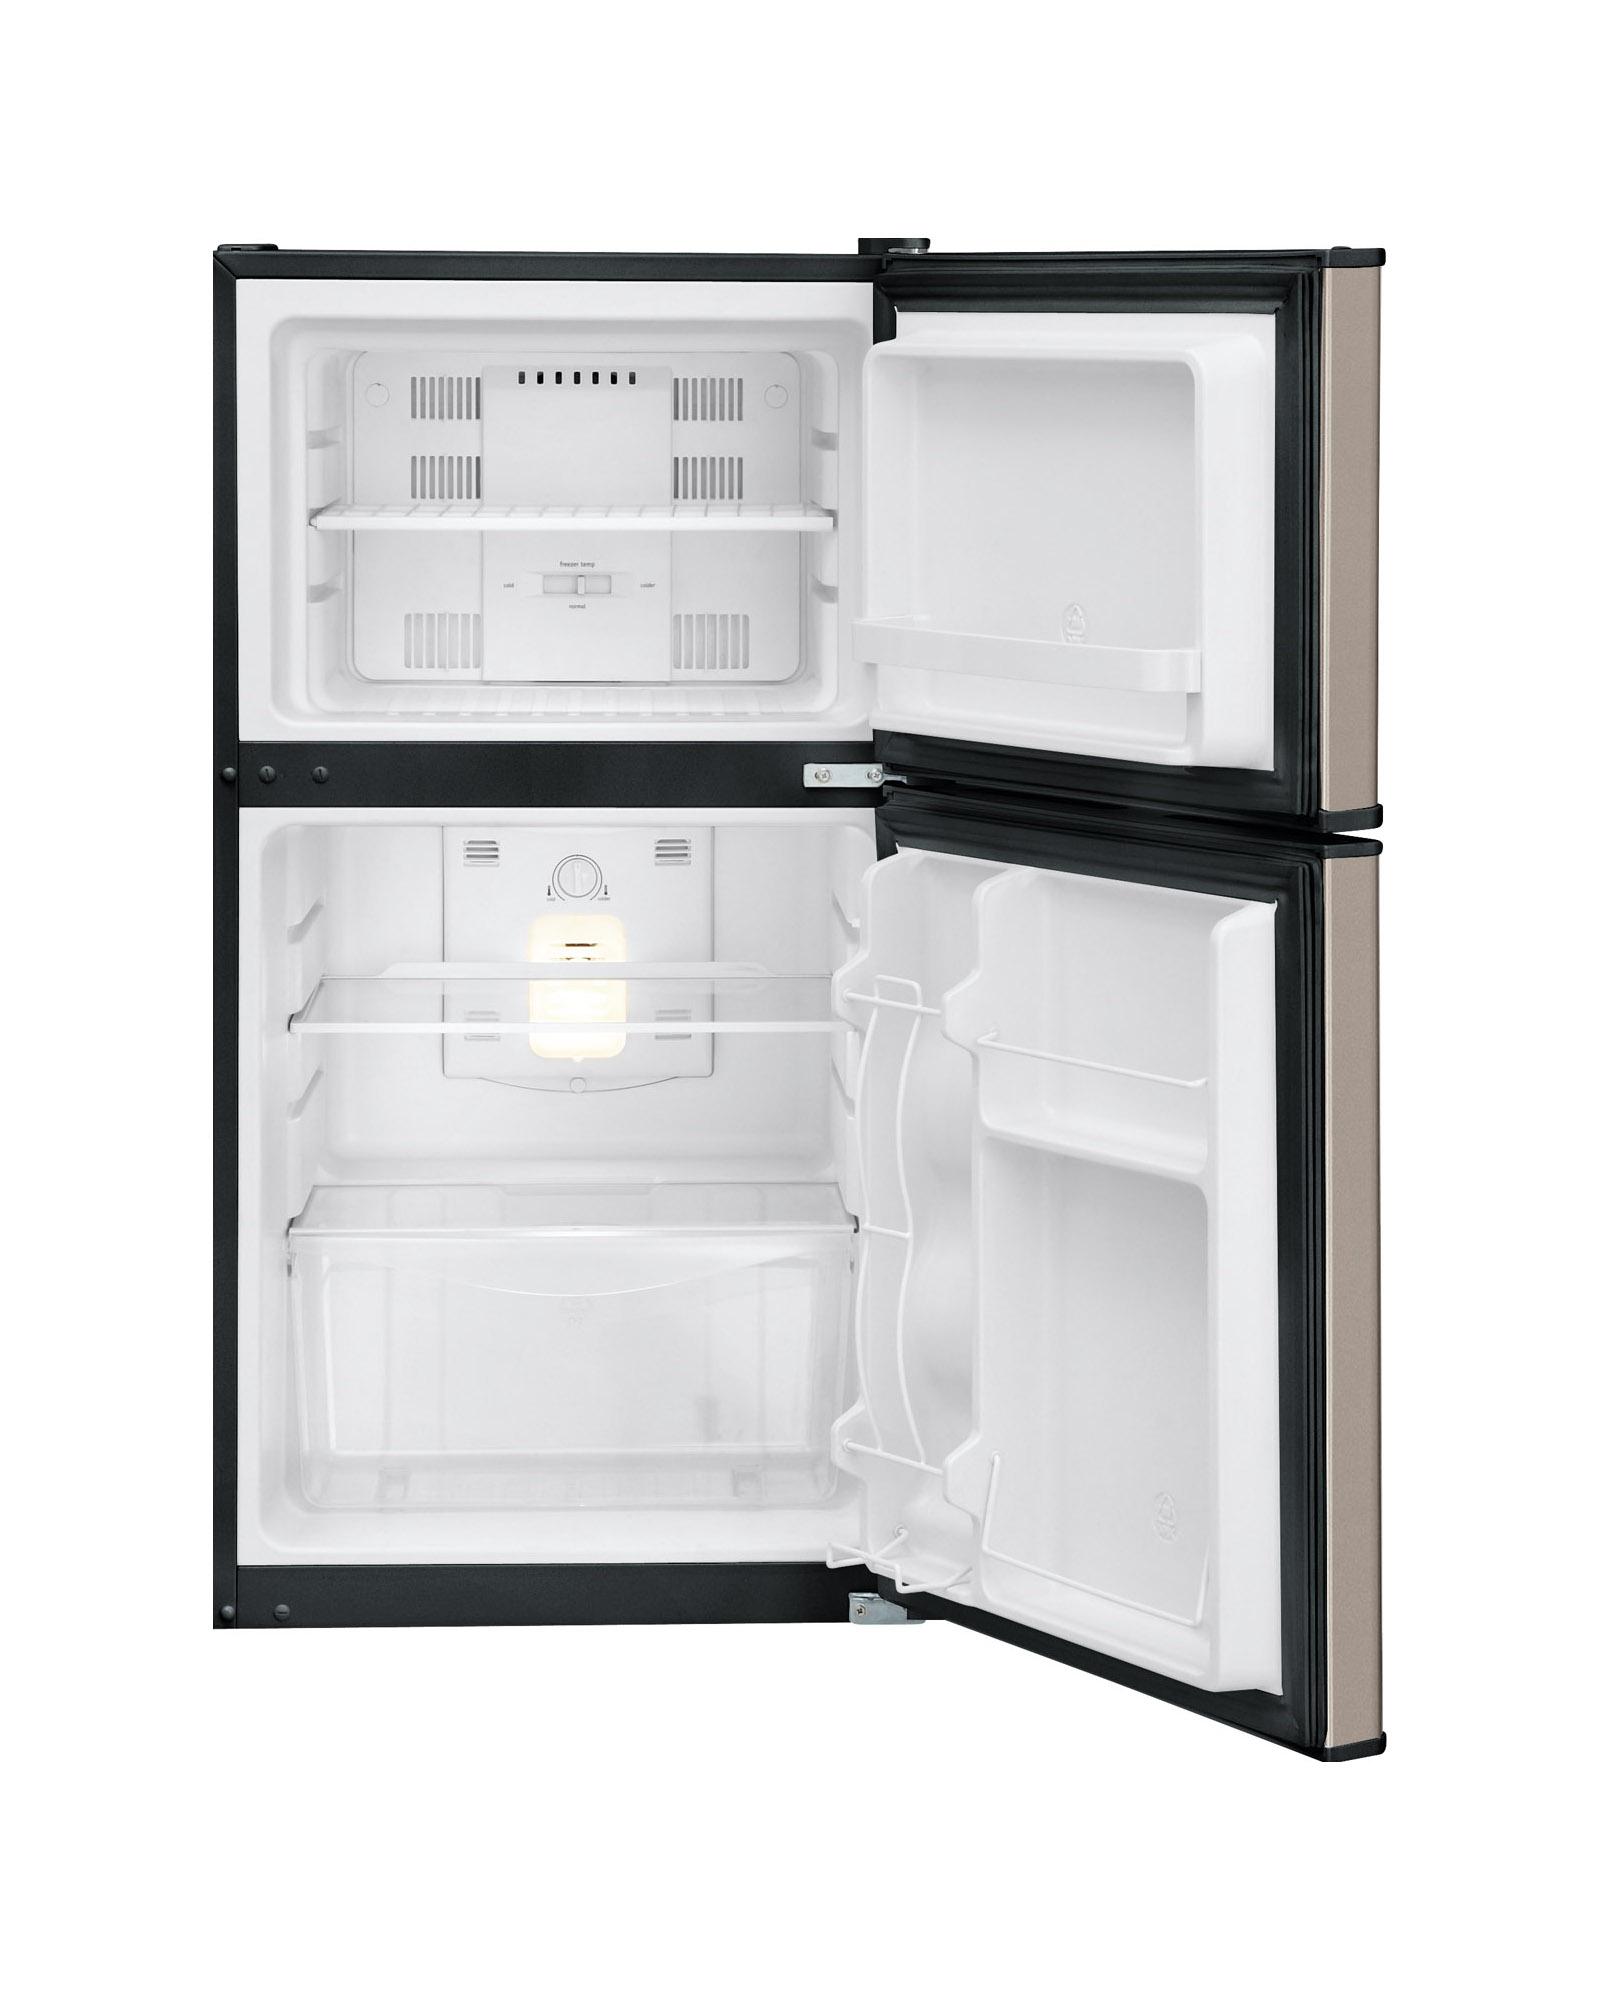 Frigidaire FFPS4533QM 4.5 cu. ft. Compact Refrigerator - Silver Mist